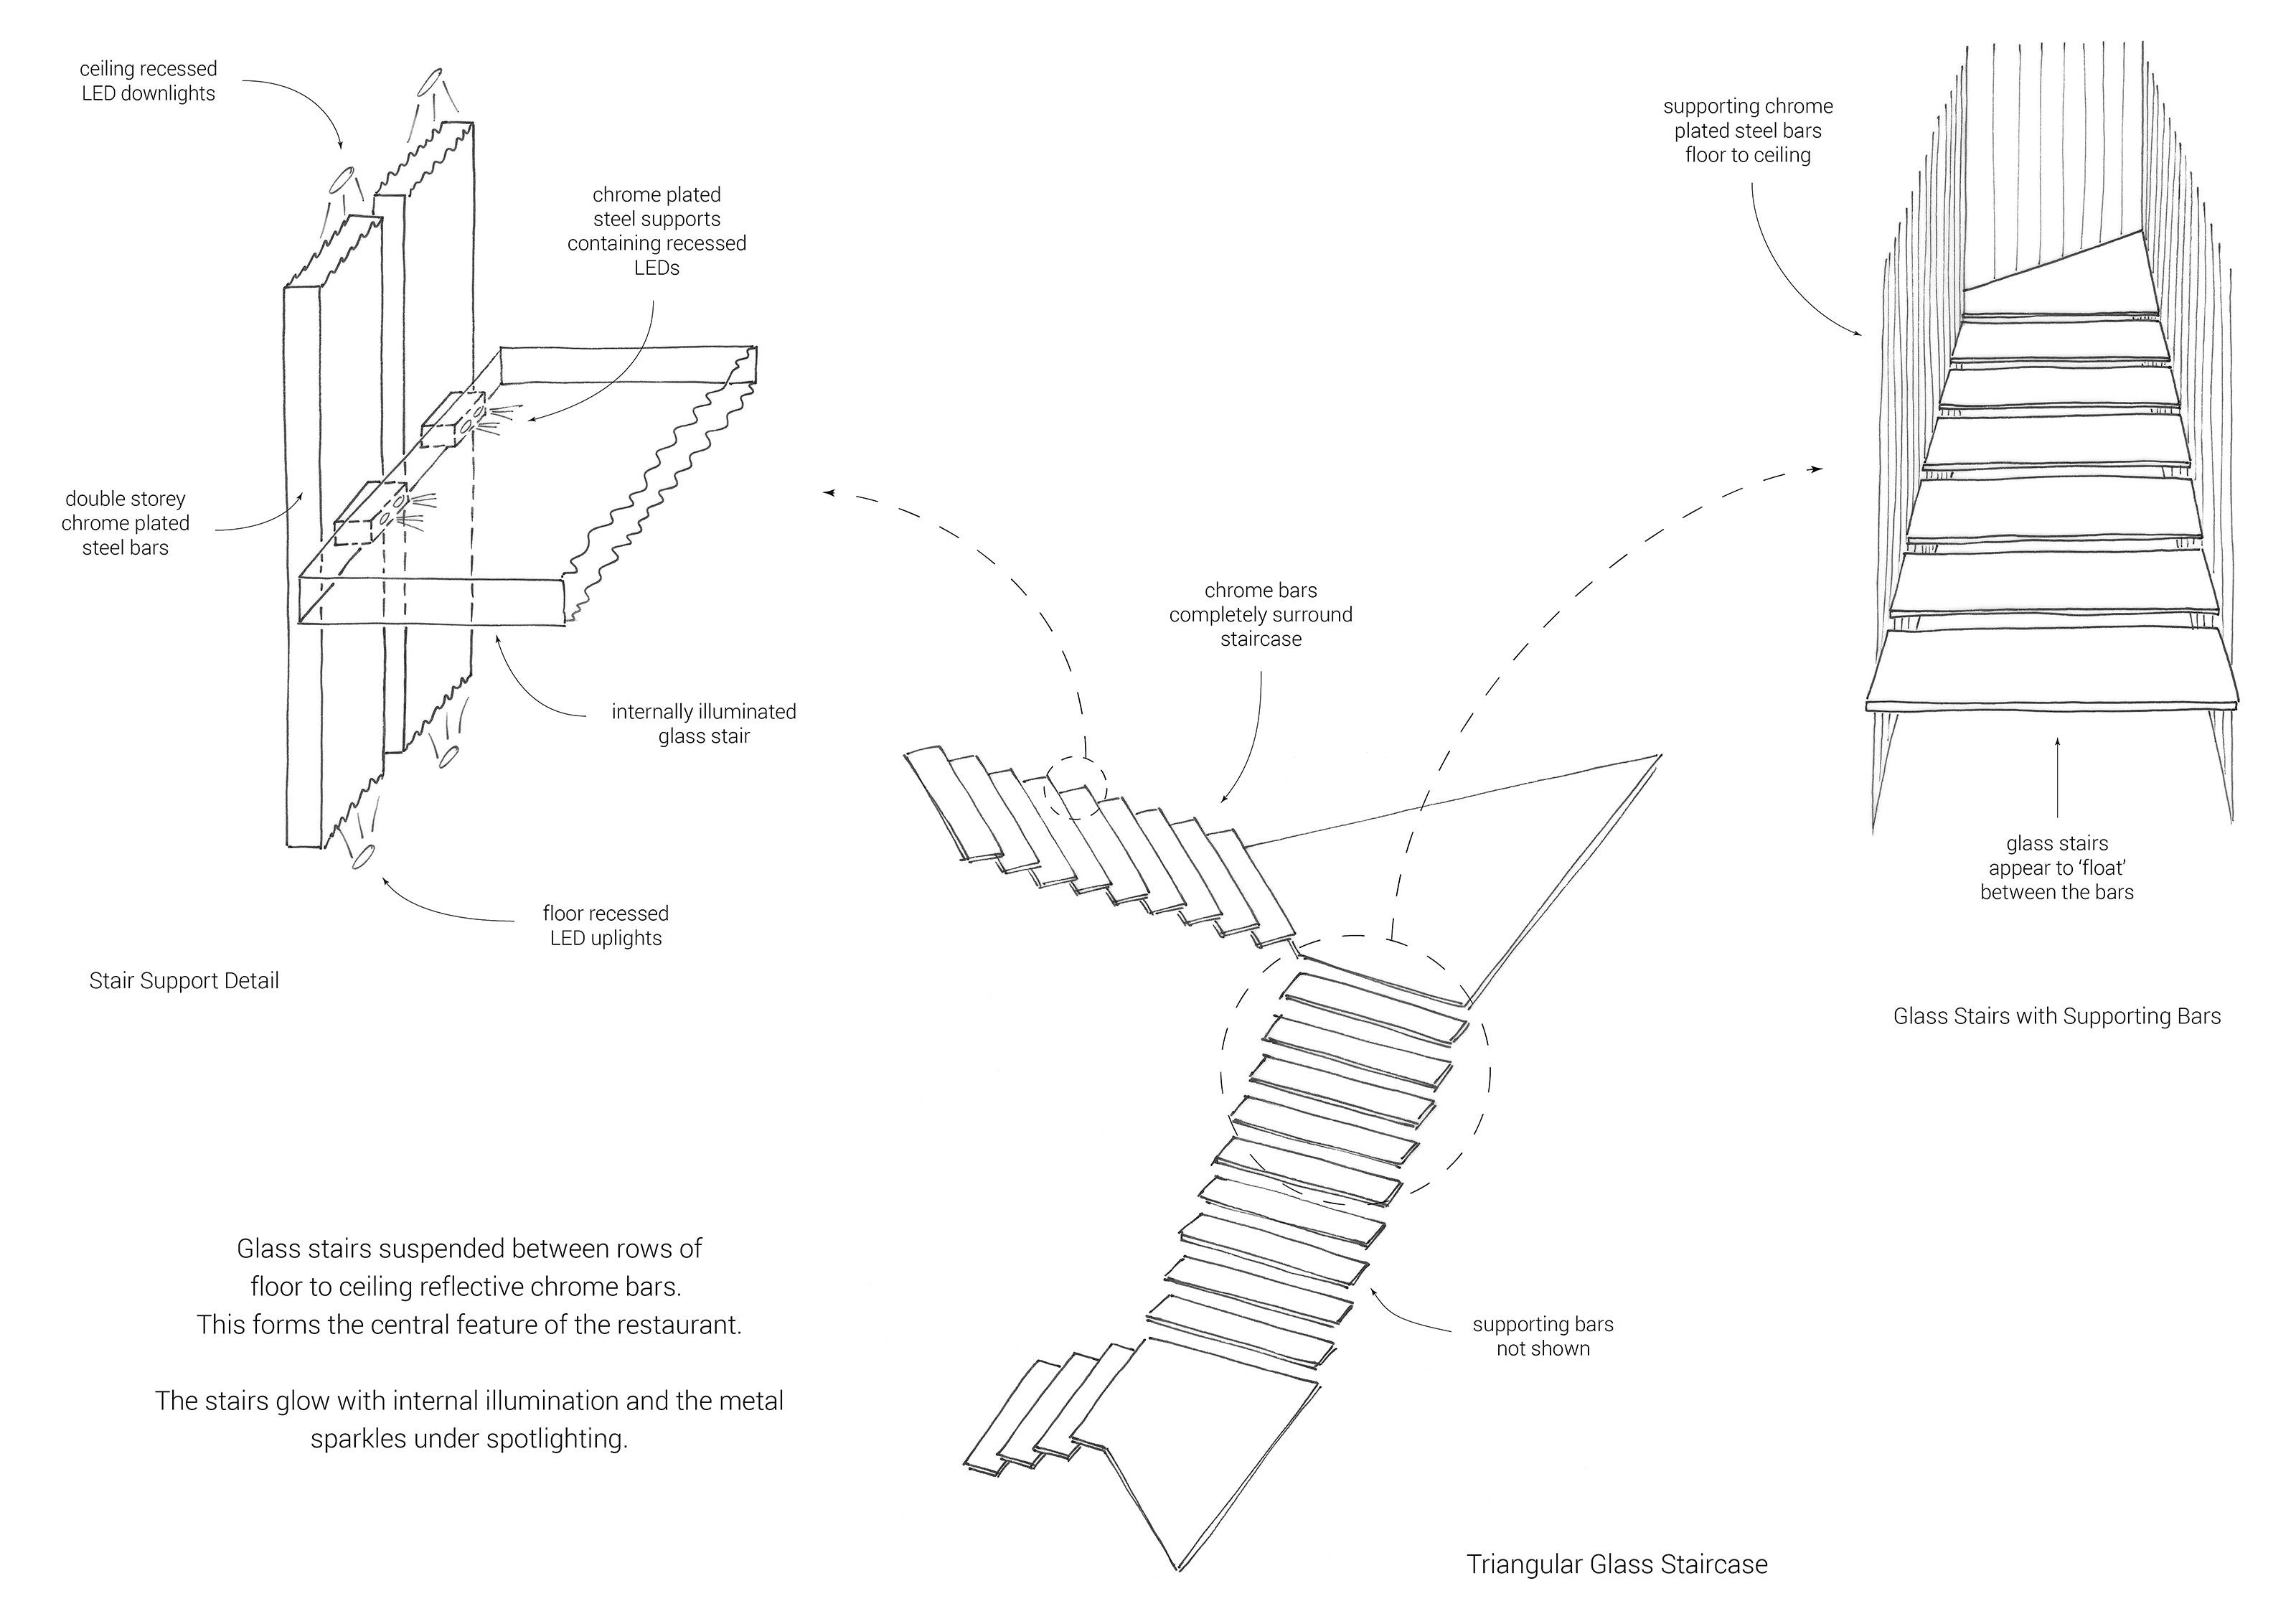 Interior design development sketch for triangular glass staircase